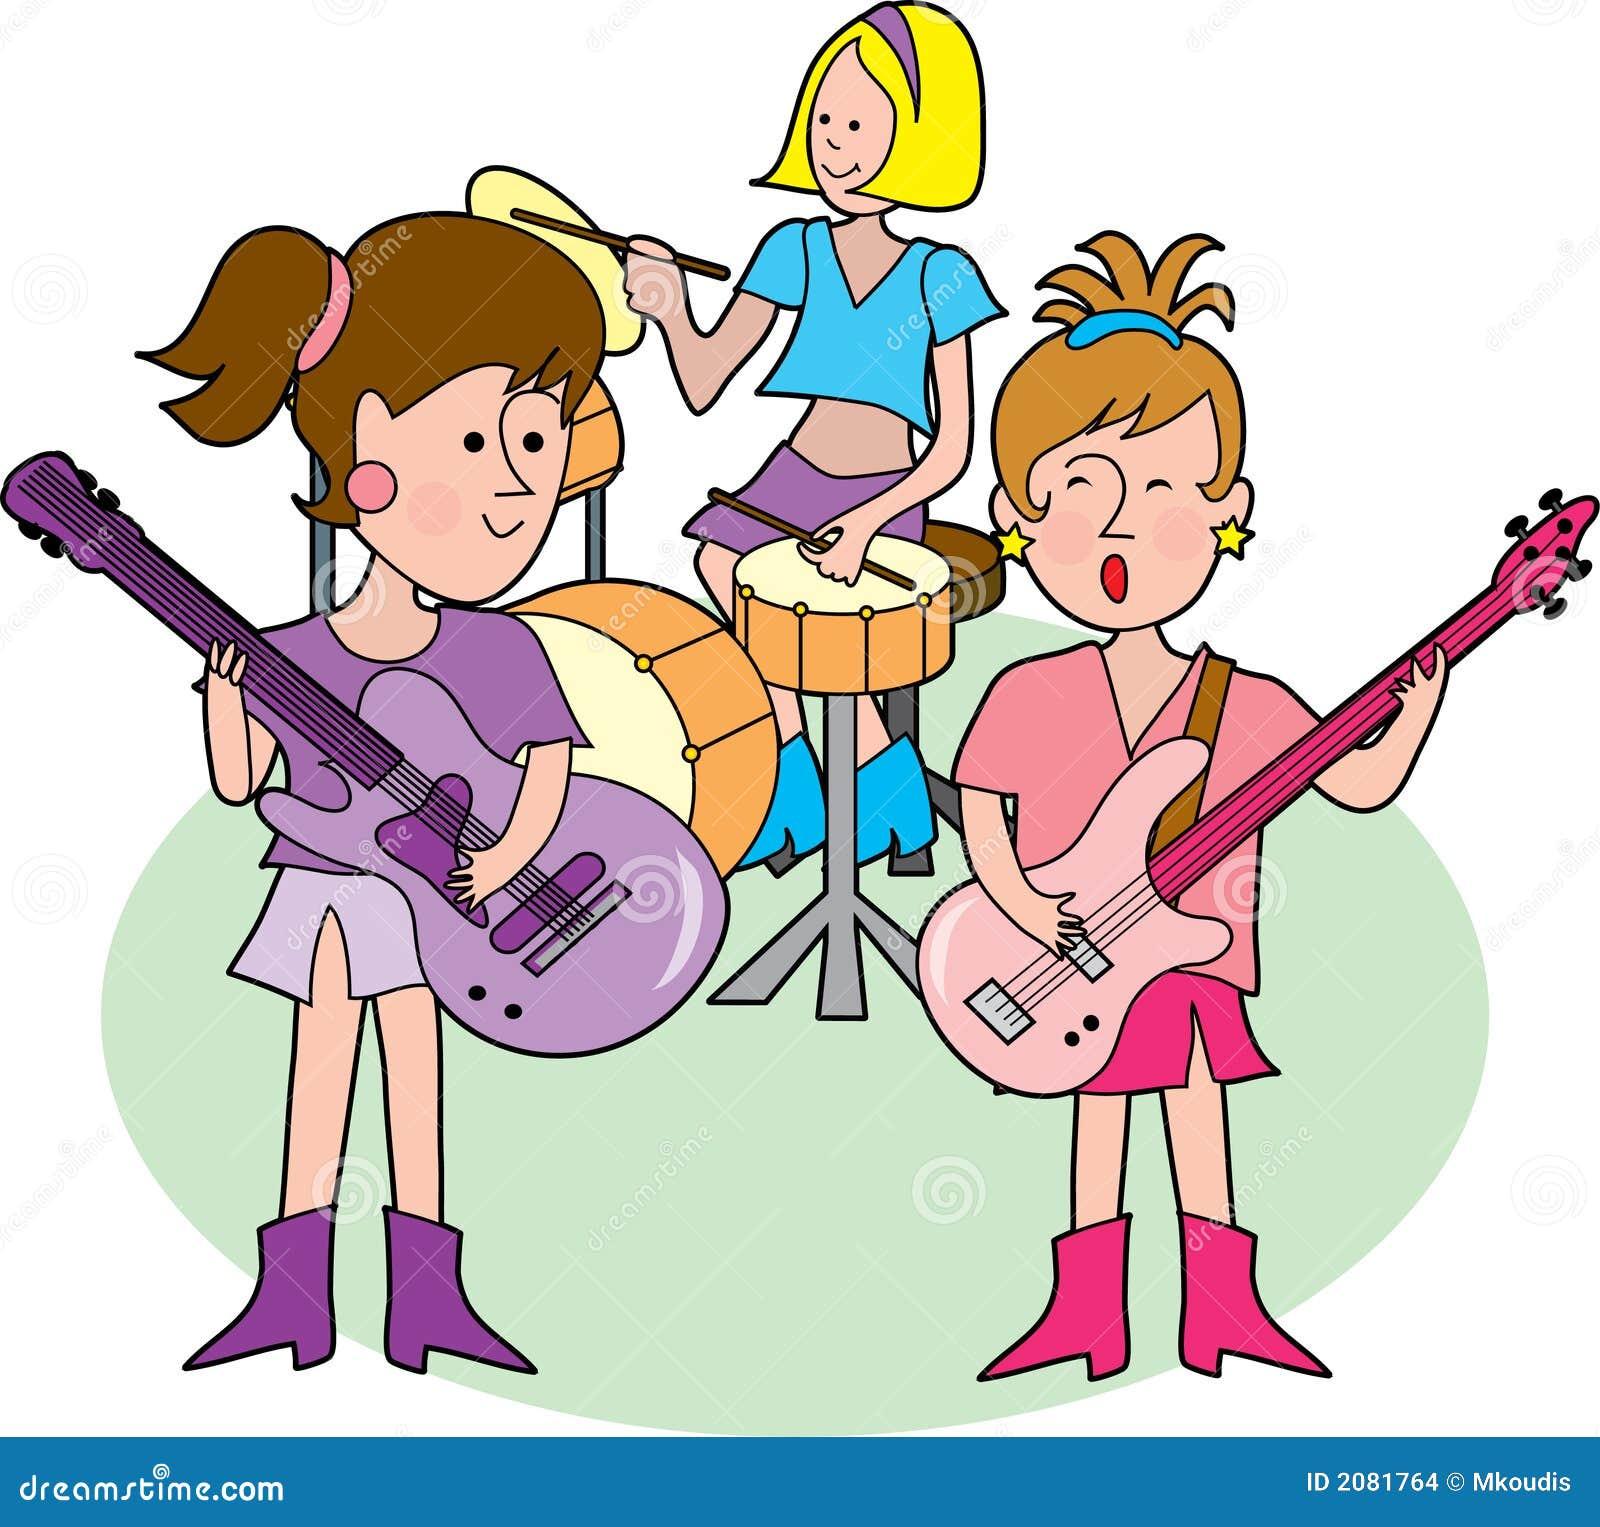 free cartoon rock band clipart - photo #41